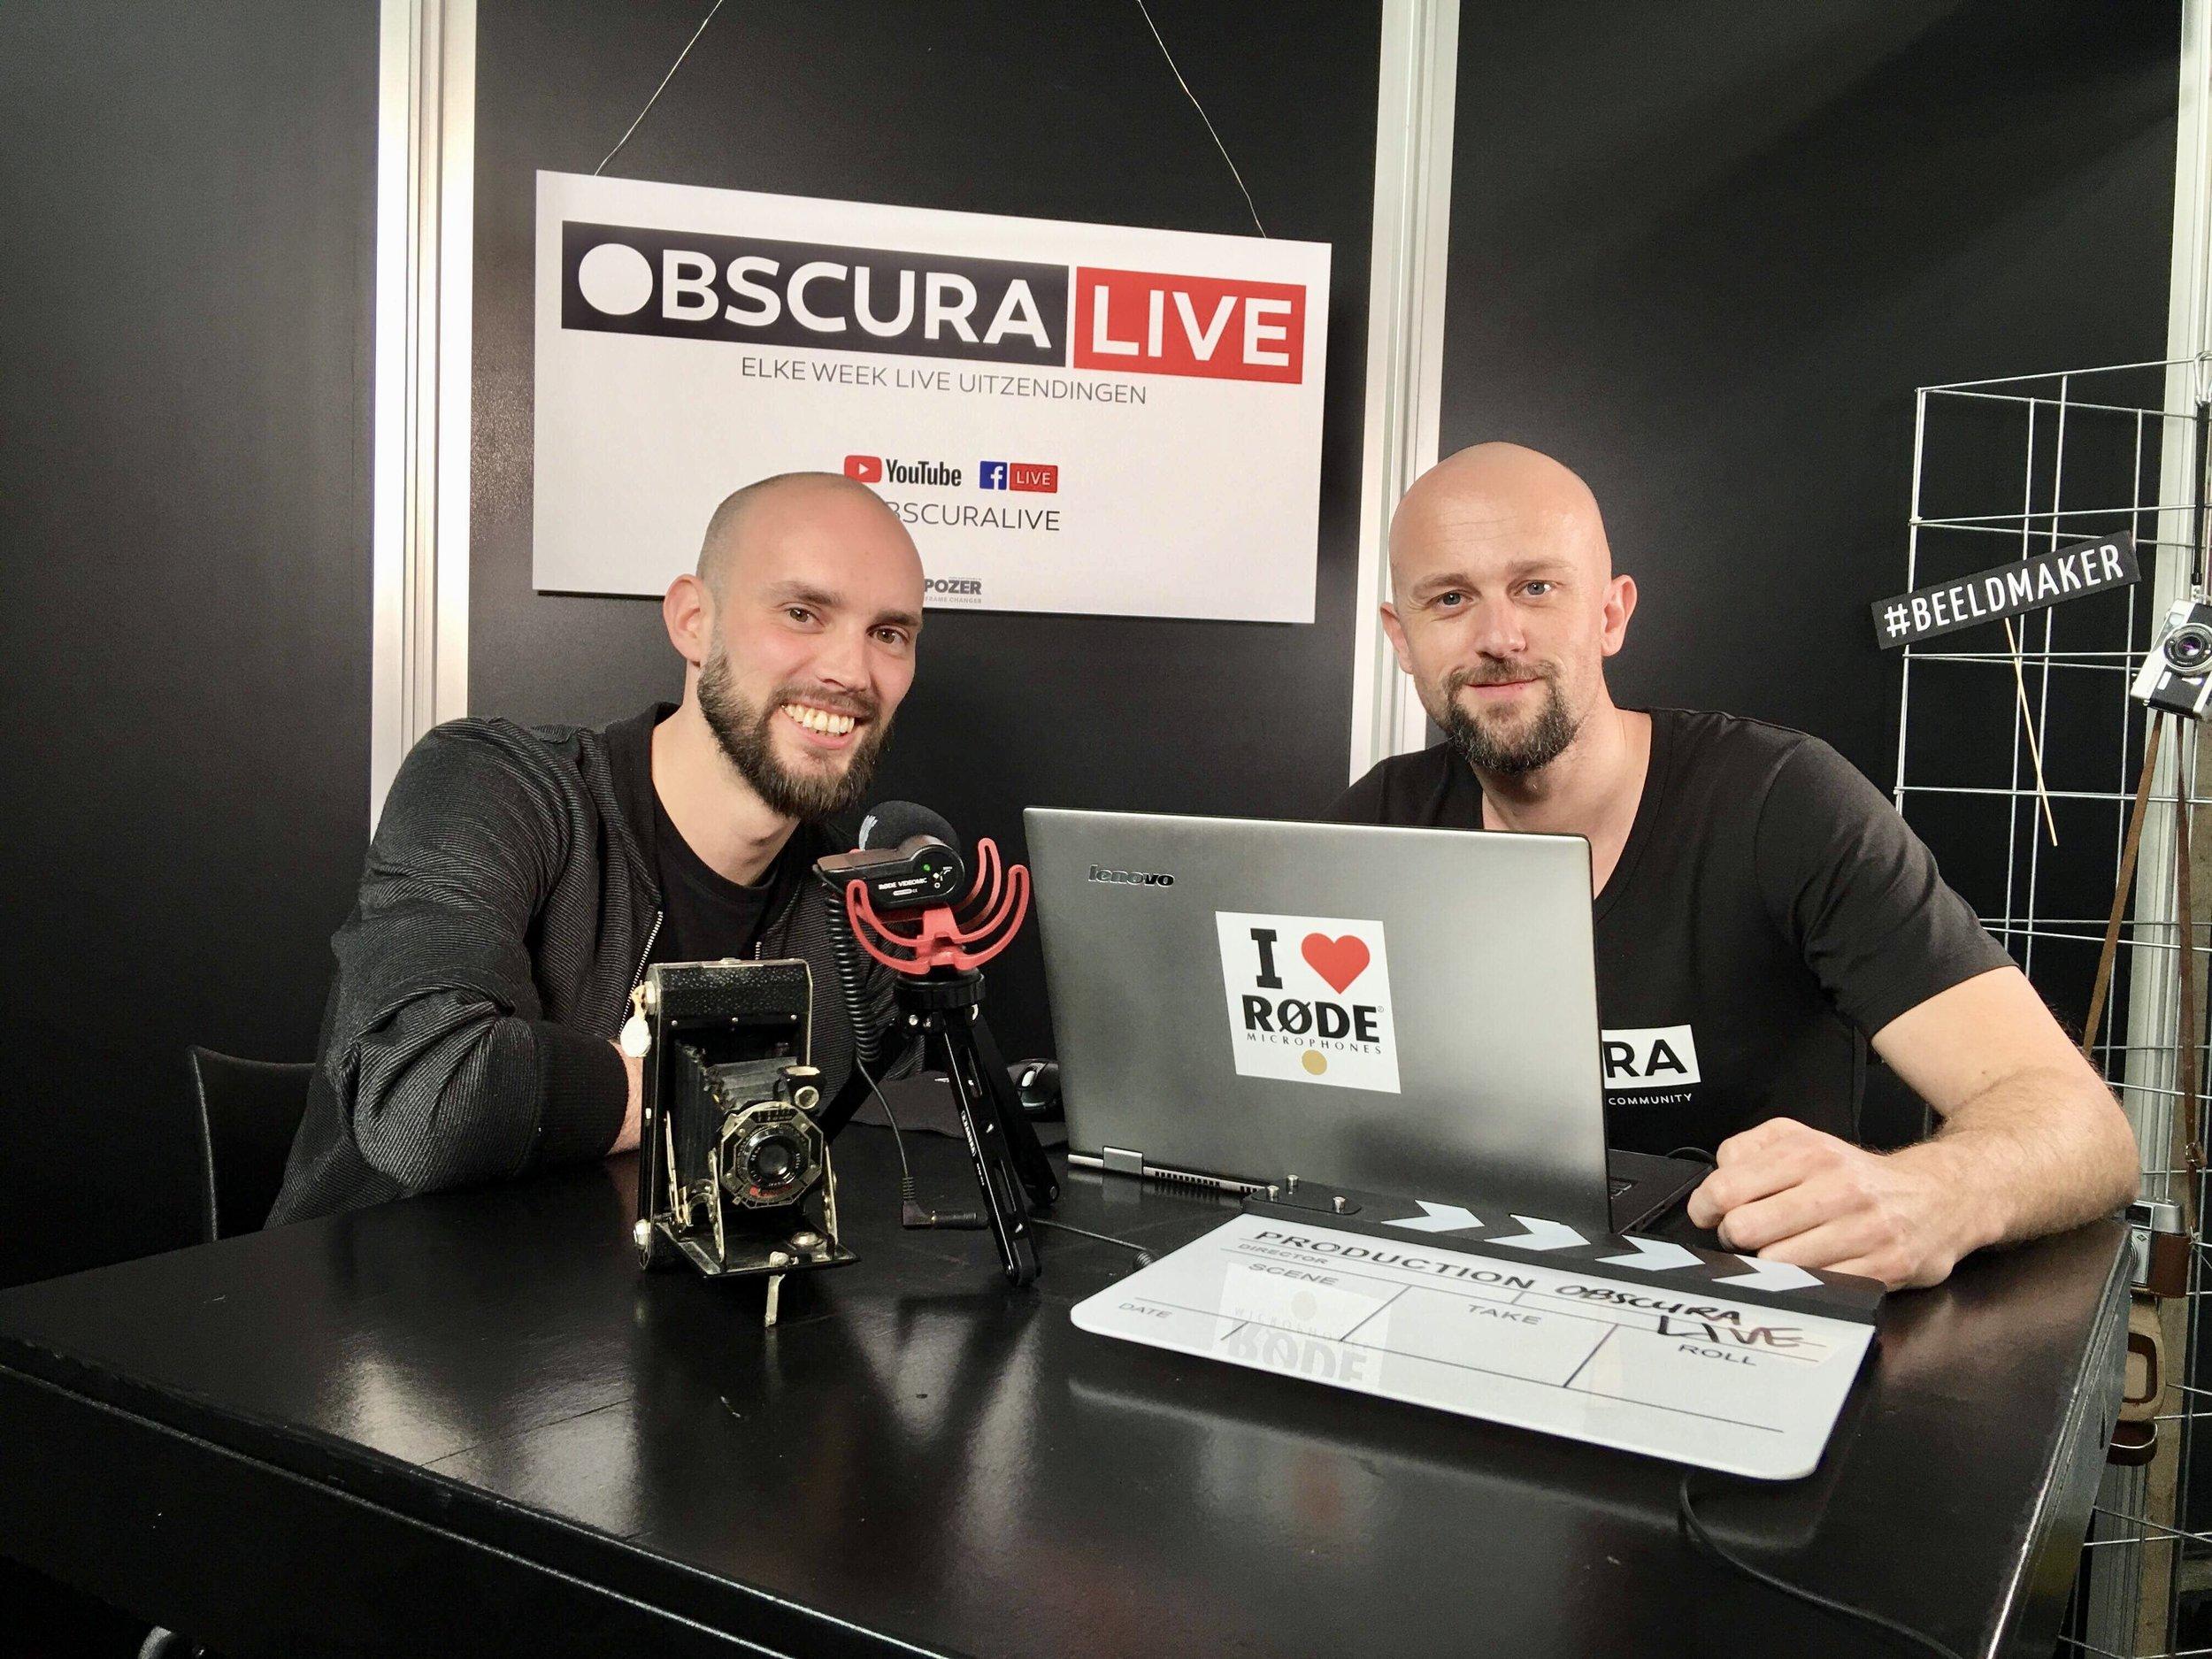 Interview bij Cafe Obscura op Professional Imaging 2018